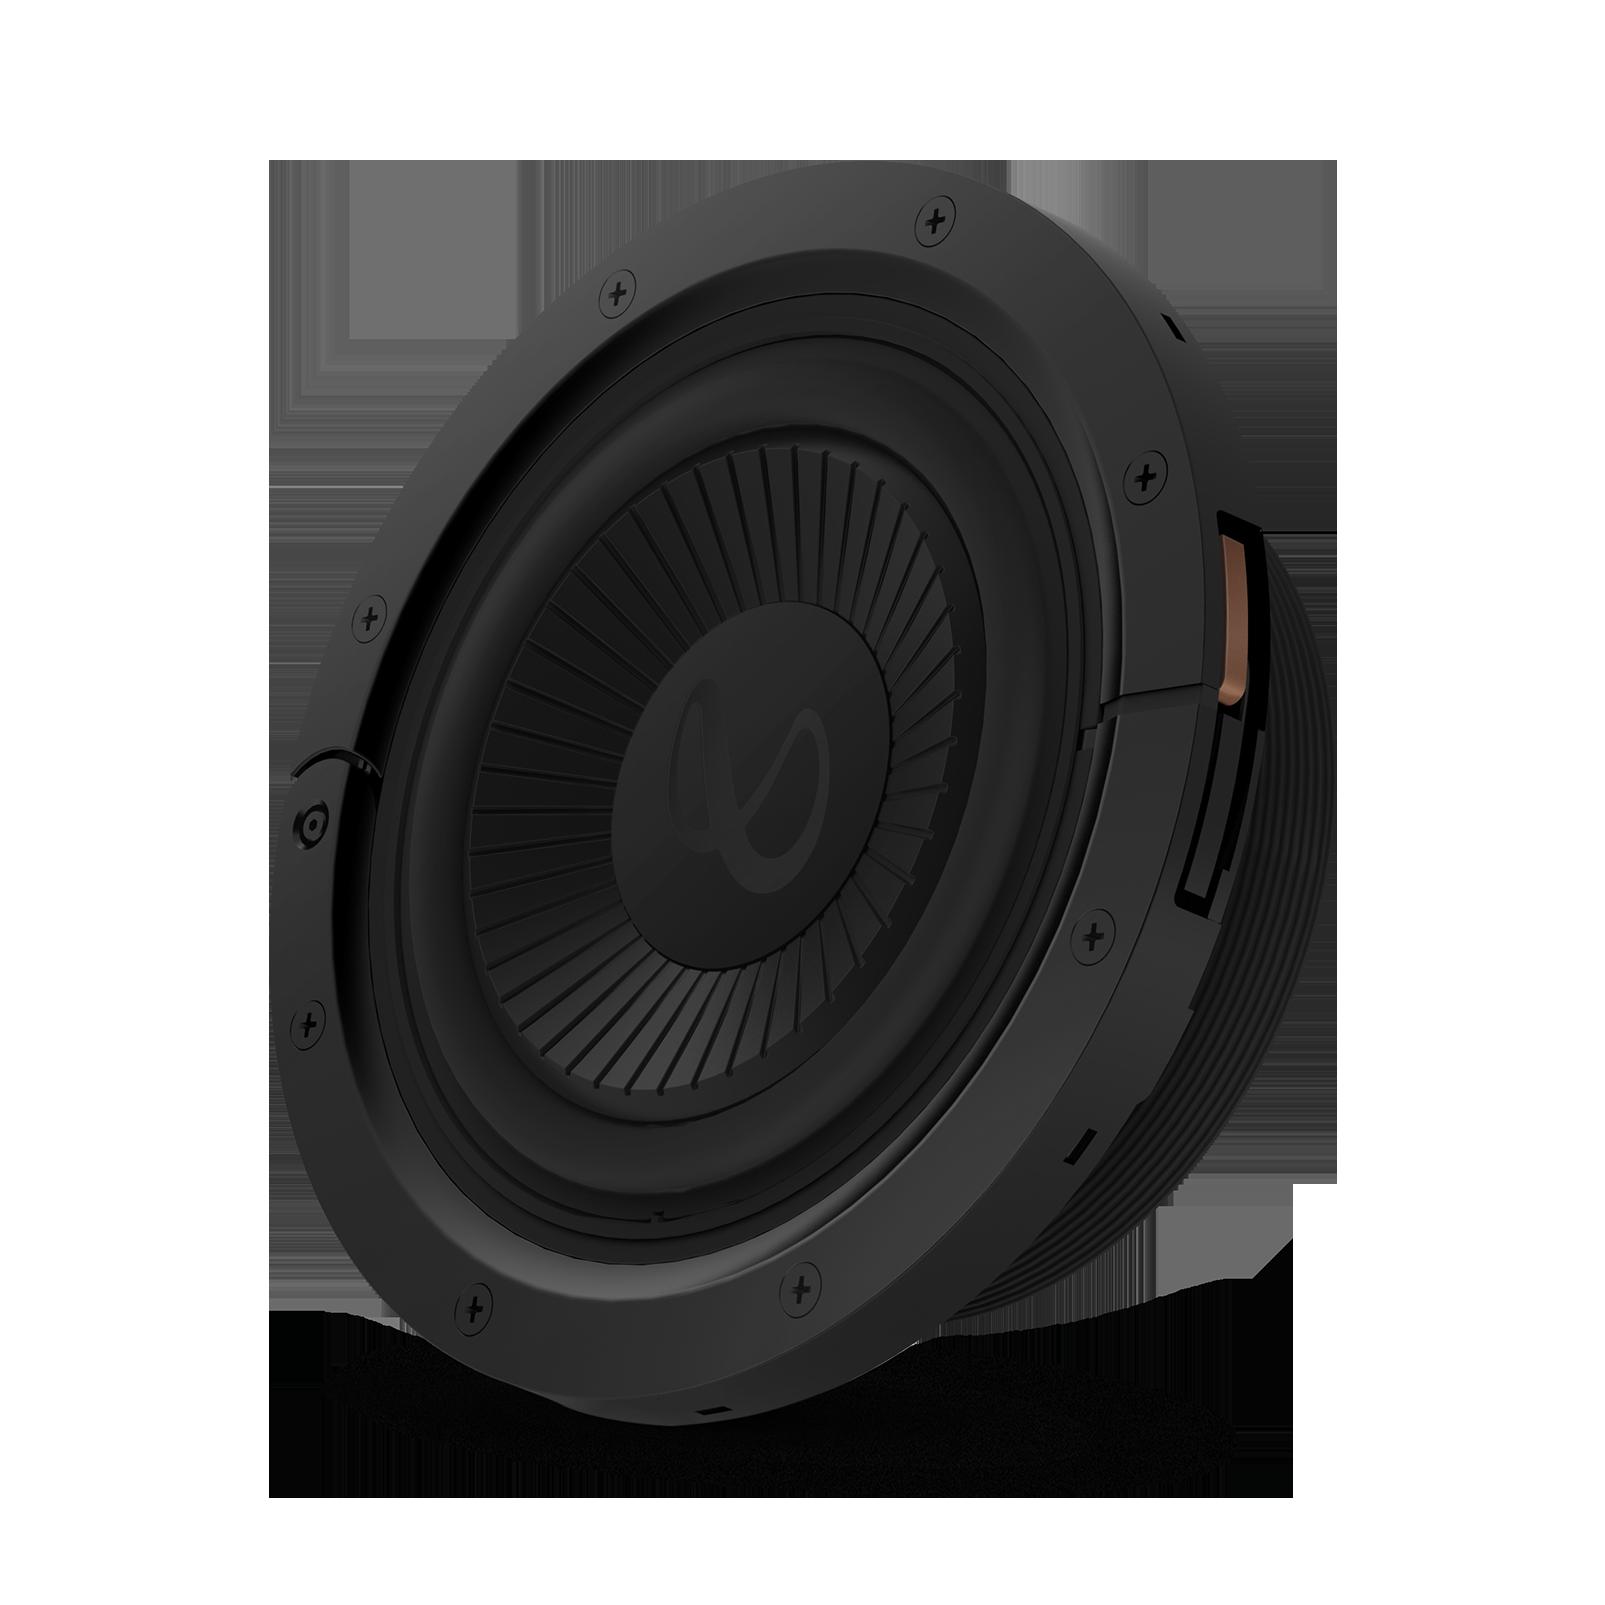 "Reference Flex Woofer 8d - Black - 8"" (200mm) adjustable depth car audio subwoofers optimized for factory location upgrades - Hero"